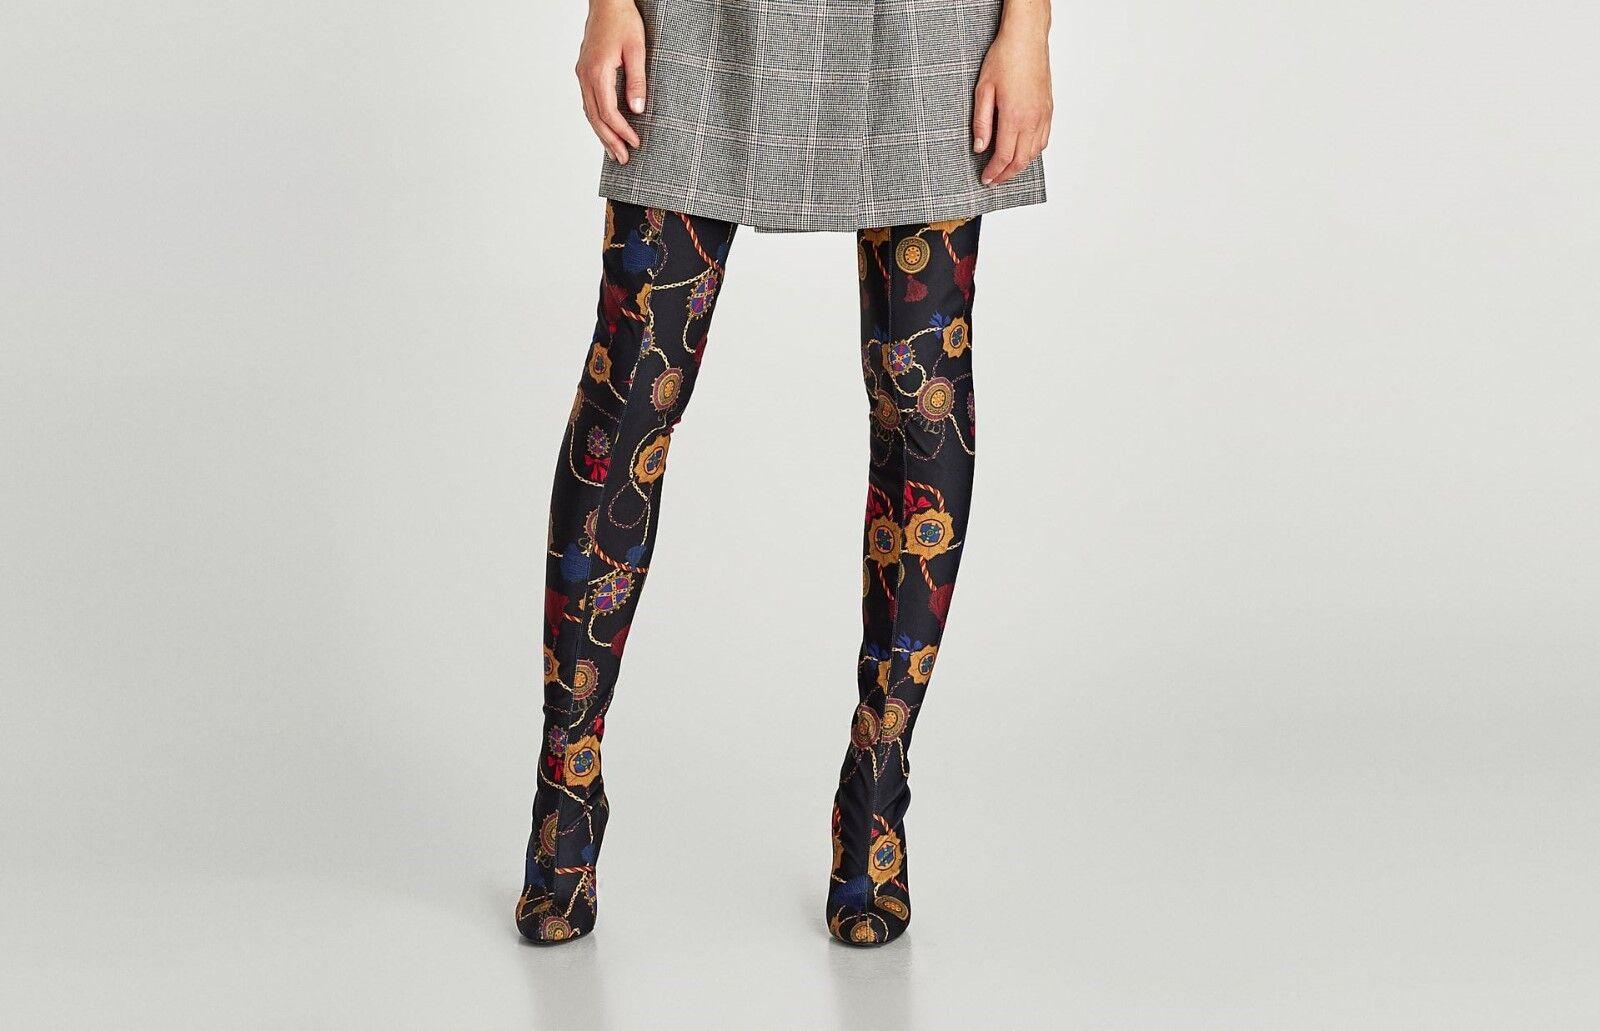 Zara con Woman BNWT sobre la rodilla Botas Taco Alto con Zara tela impresa Ref: 5013/201 ce3a64